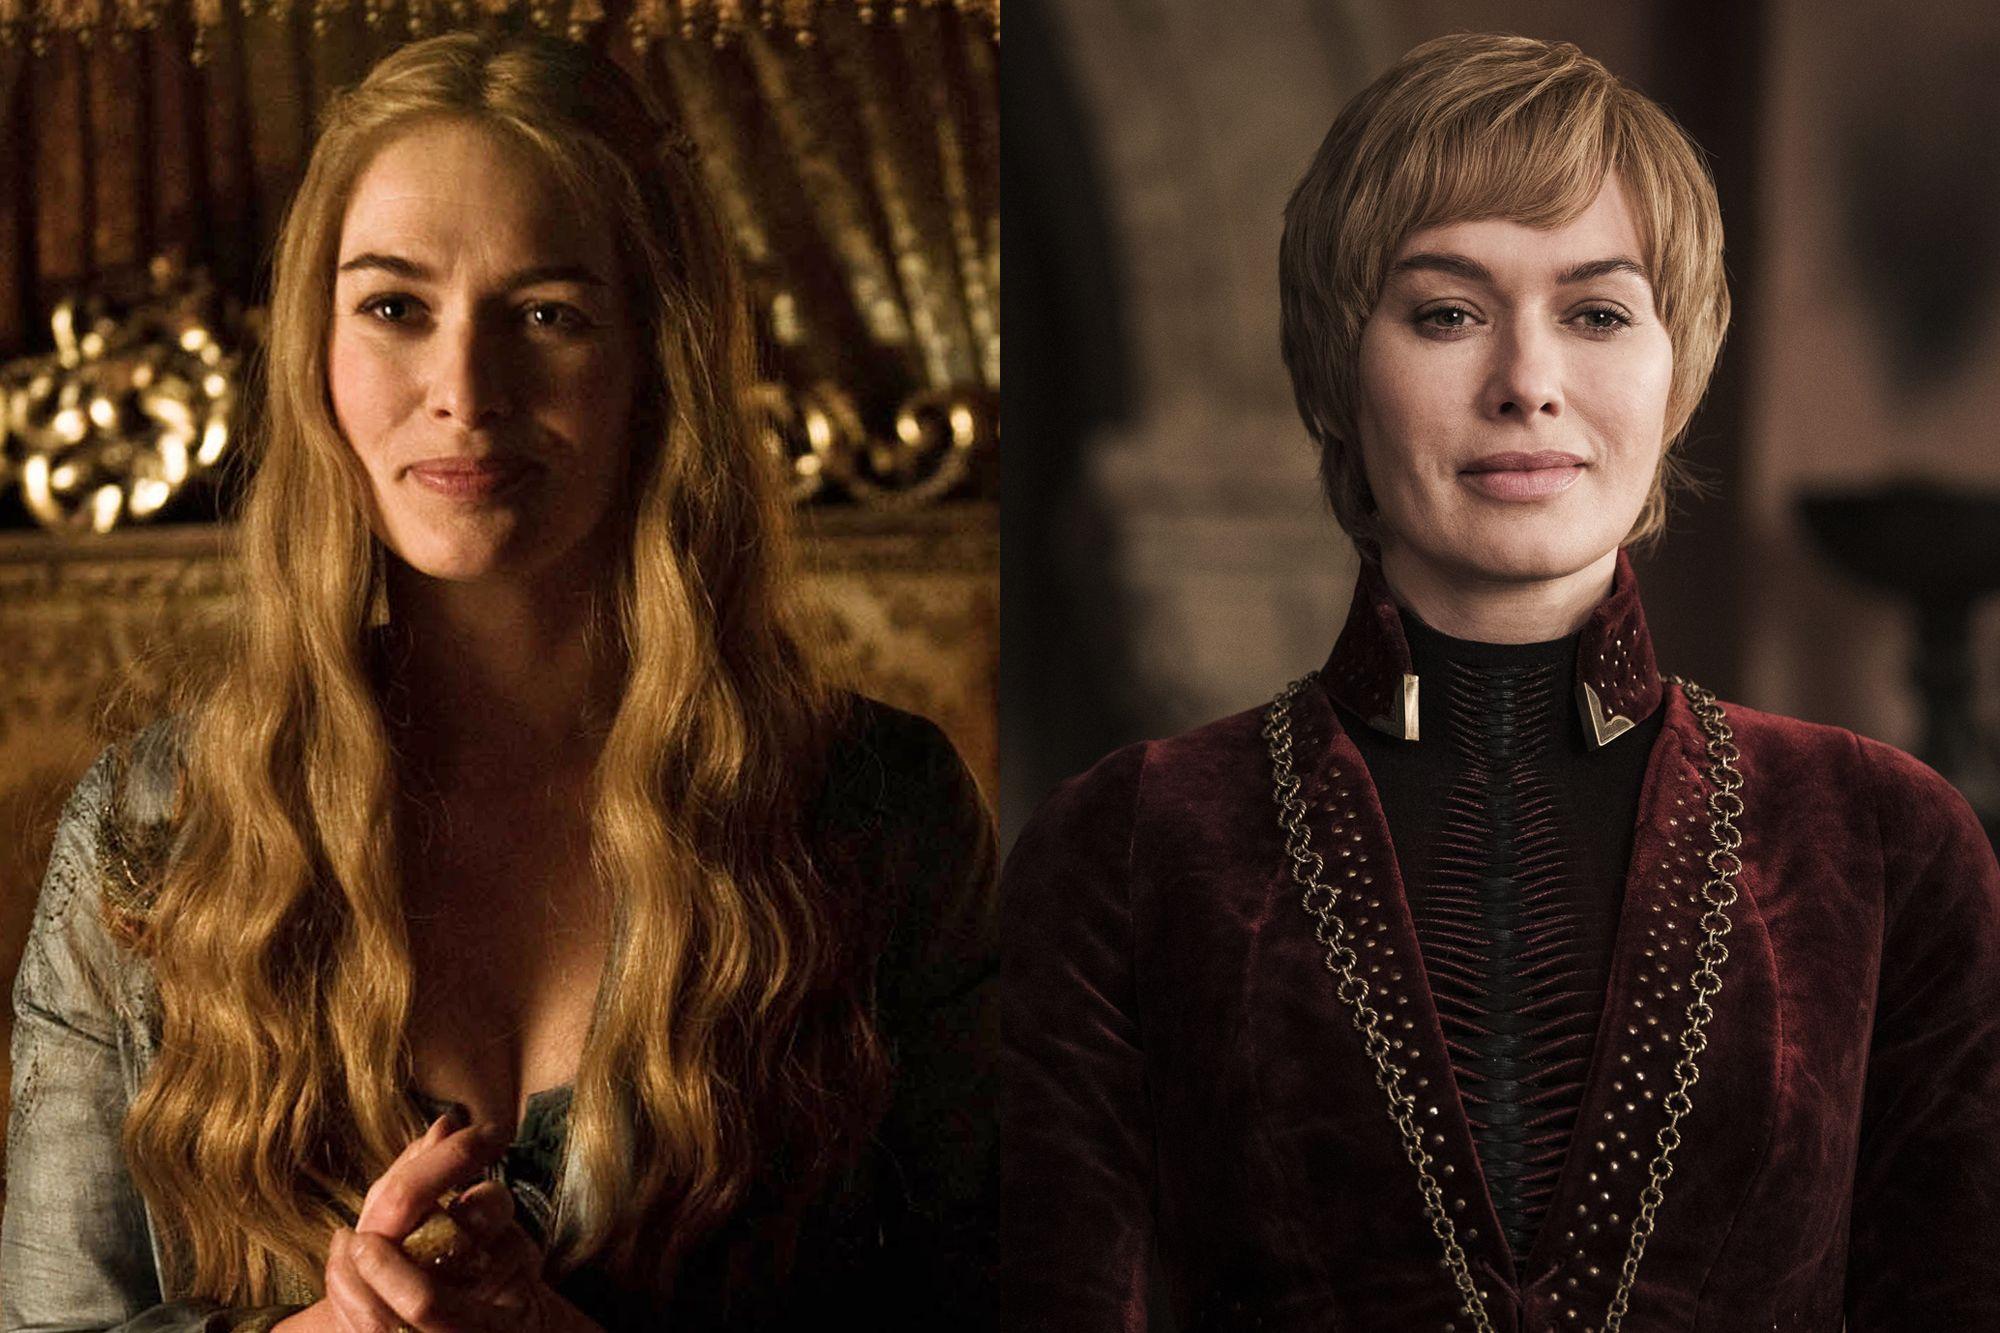 Lena Headey as Cersei Lannister Season One to Season Eight.